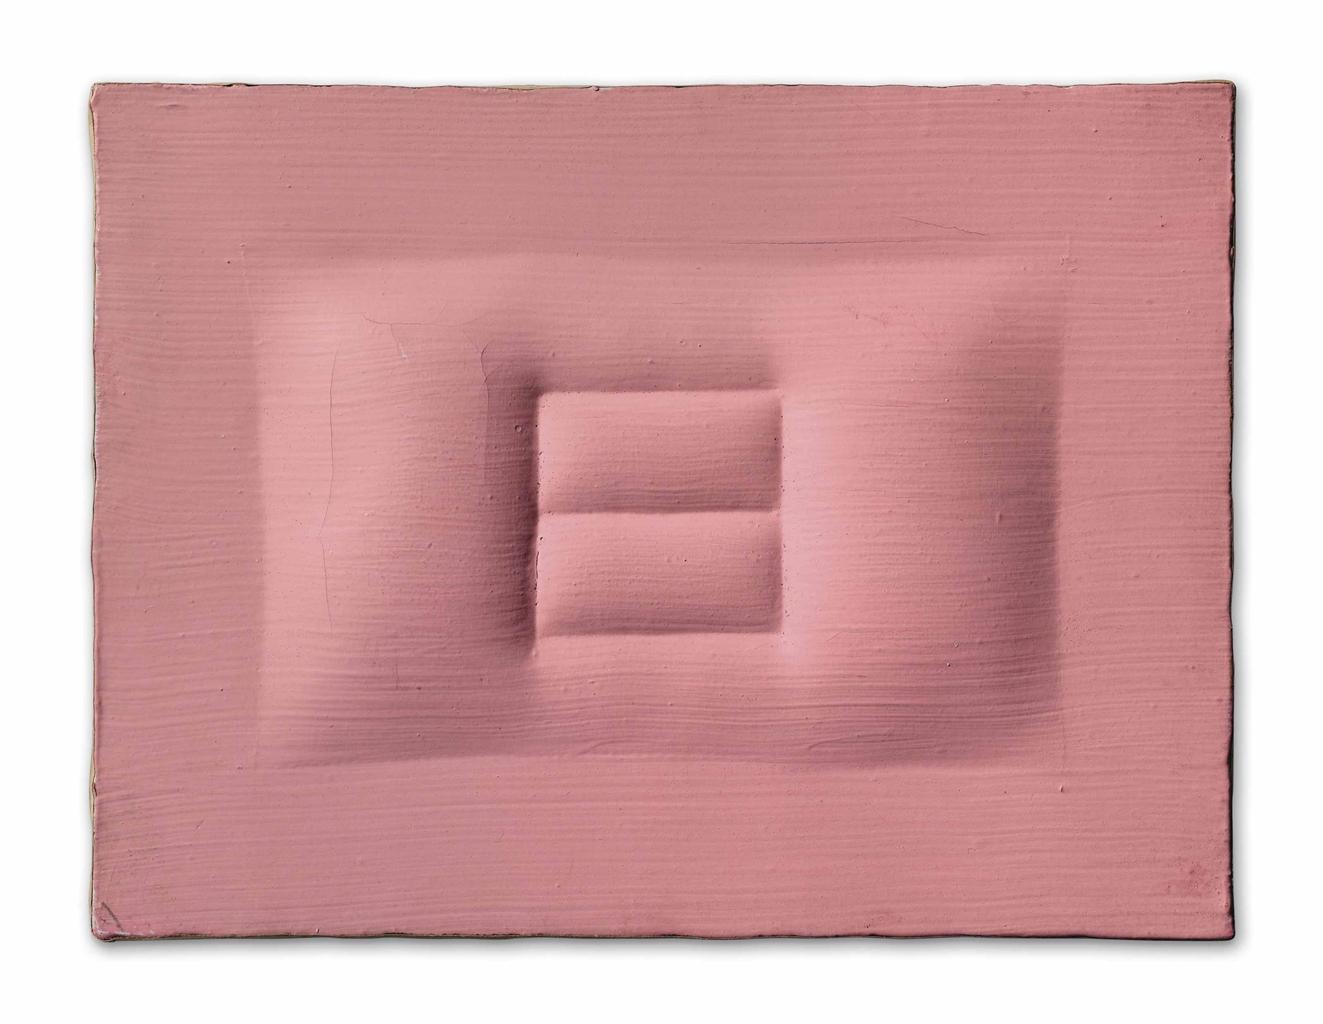 Agostino Bonalumi-Rosa (Pink)-1963